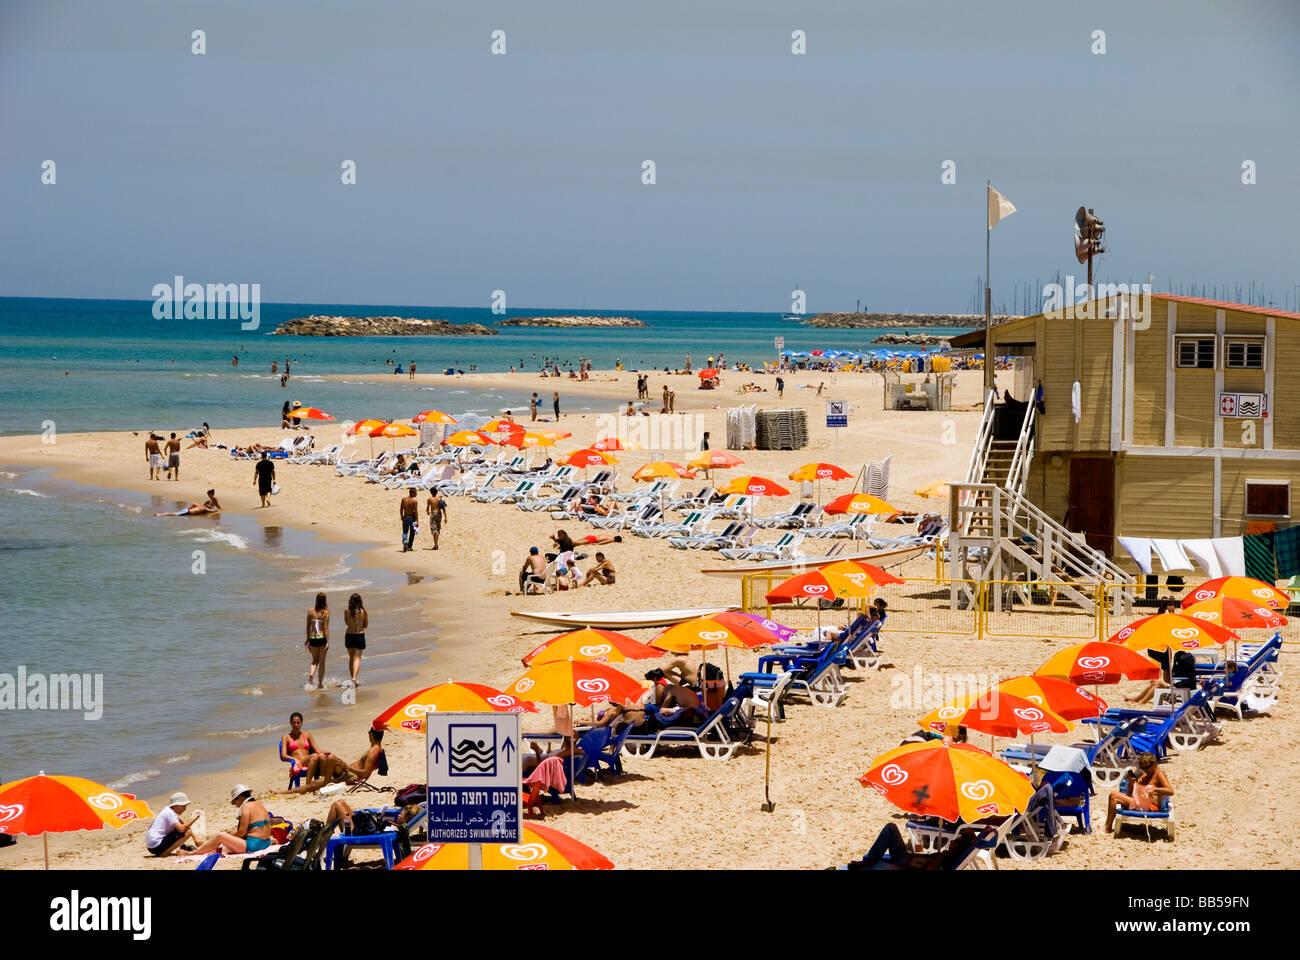 tel aviv beach, Israel - Stock Image